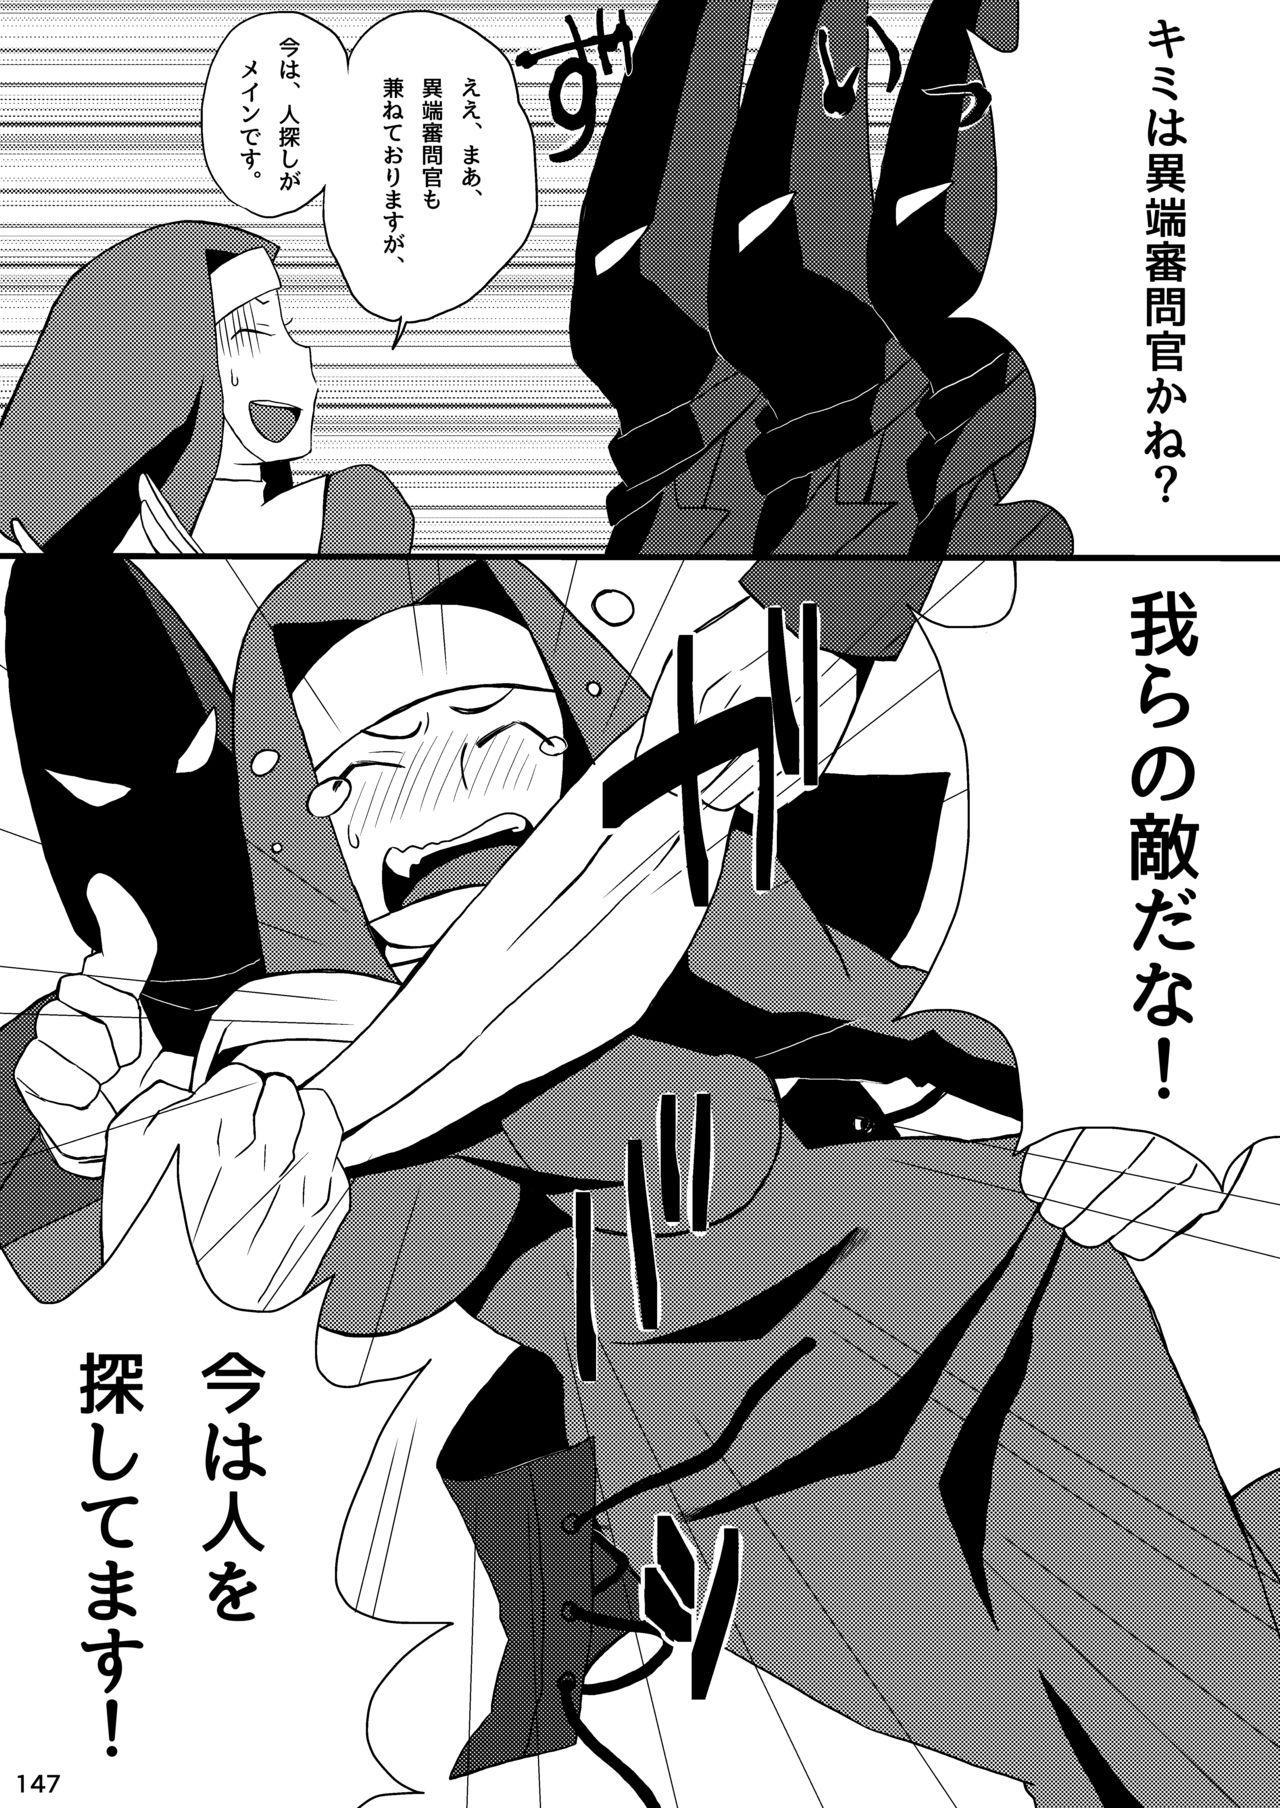 Akatsuki Blitzkampf & EN-1 Perfekt Welt Gangbang Anthology 146